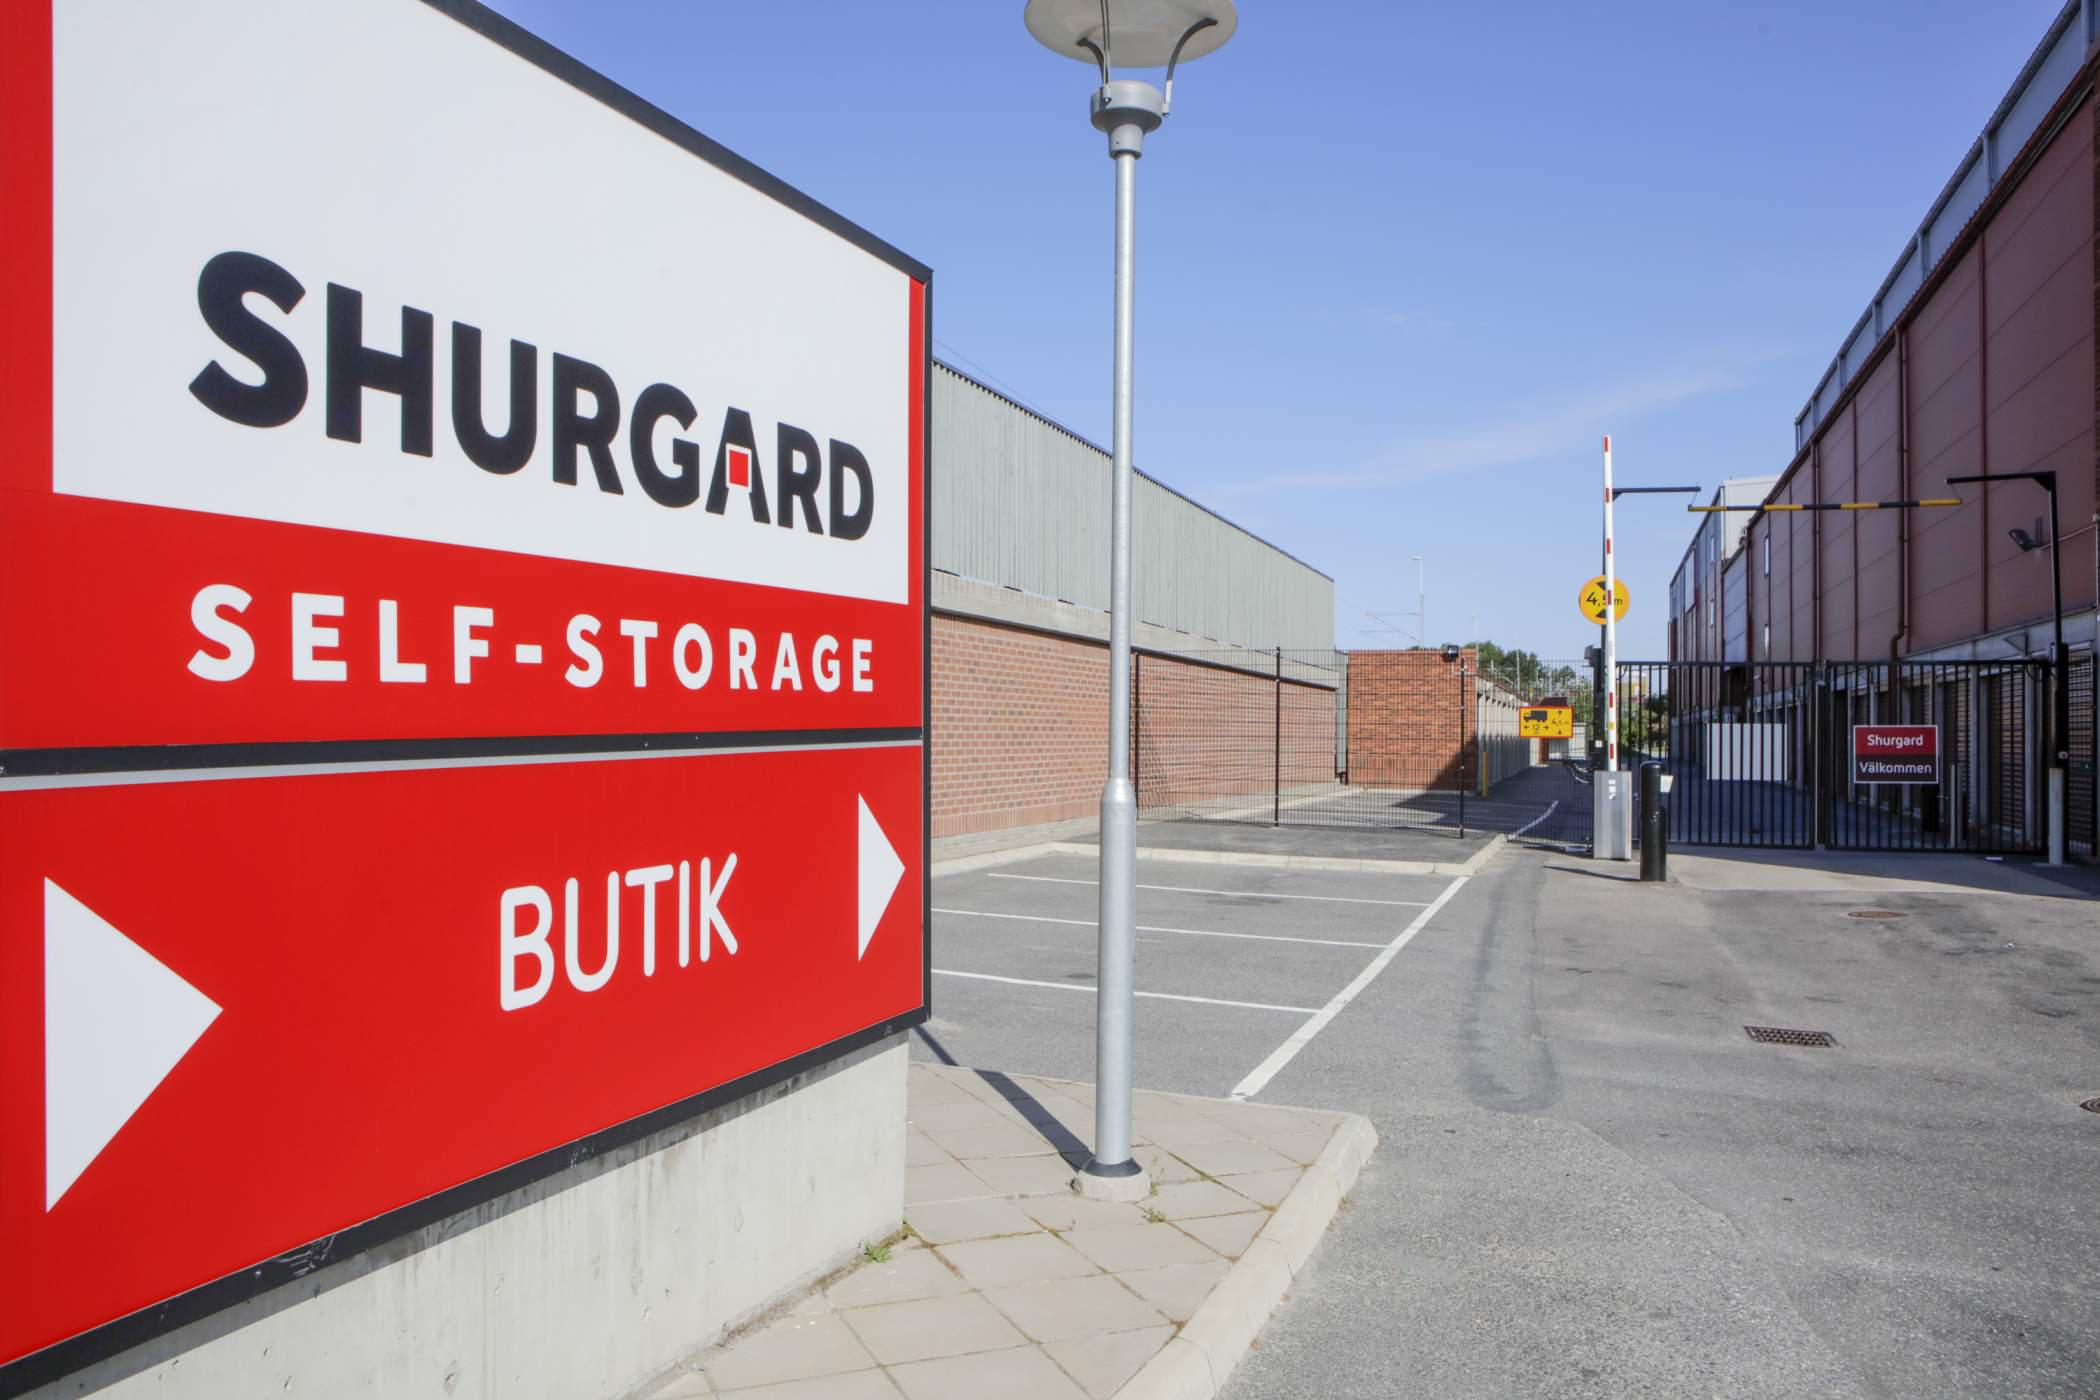 Shurgard Self-Storage Solna